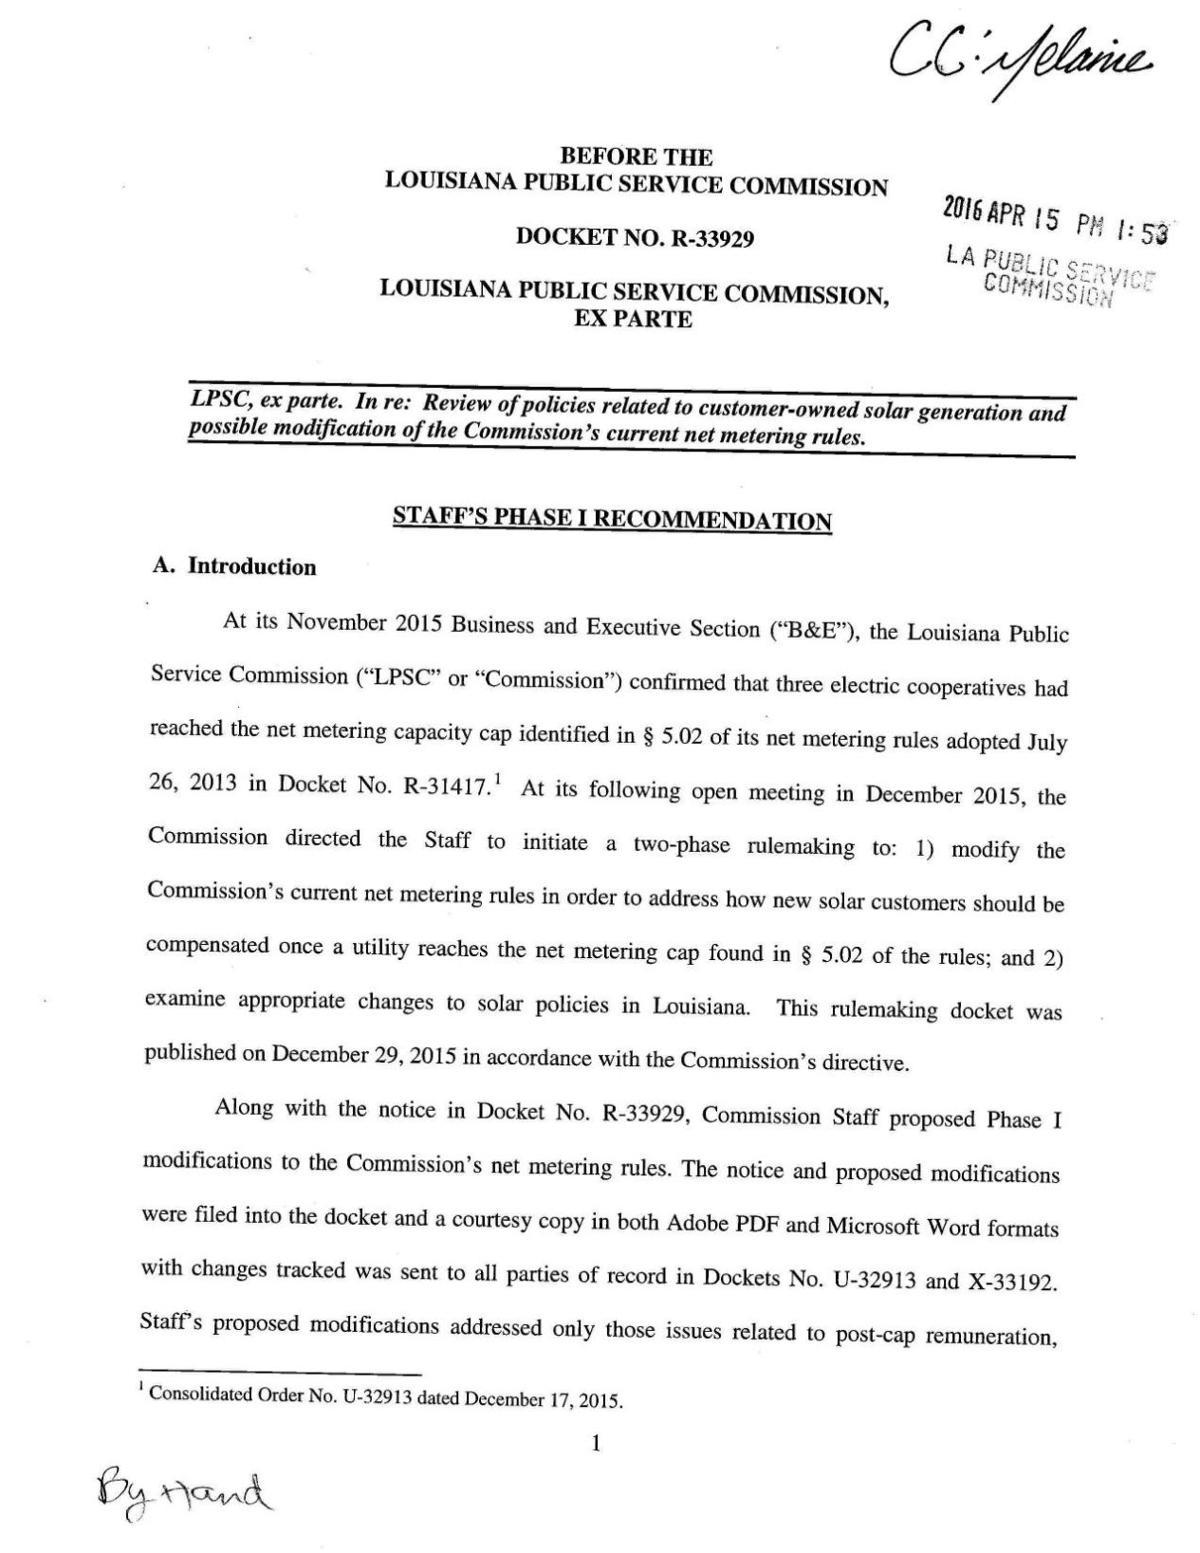 PSC Staff Net Metering Proposal